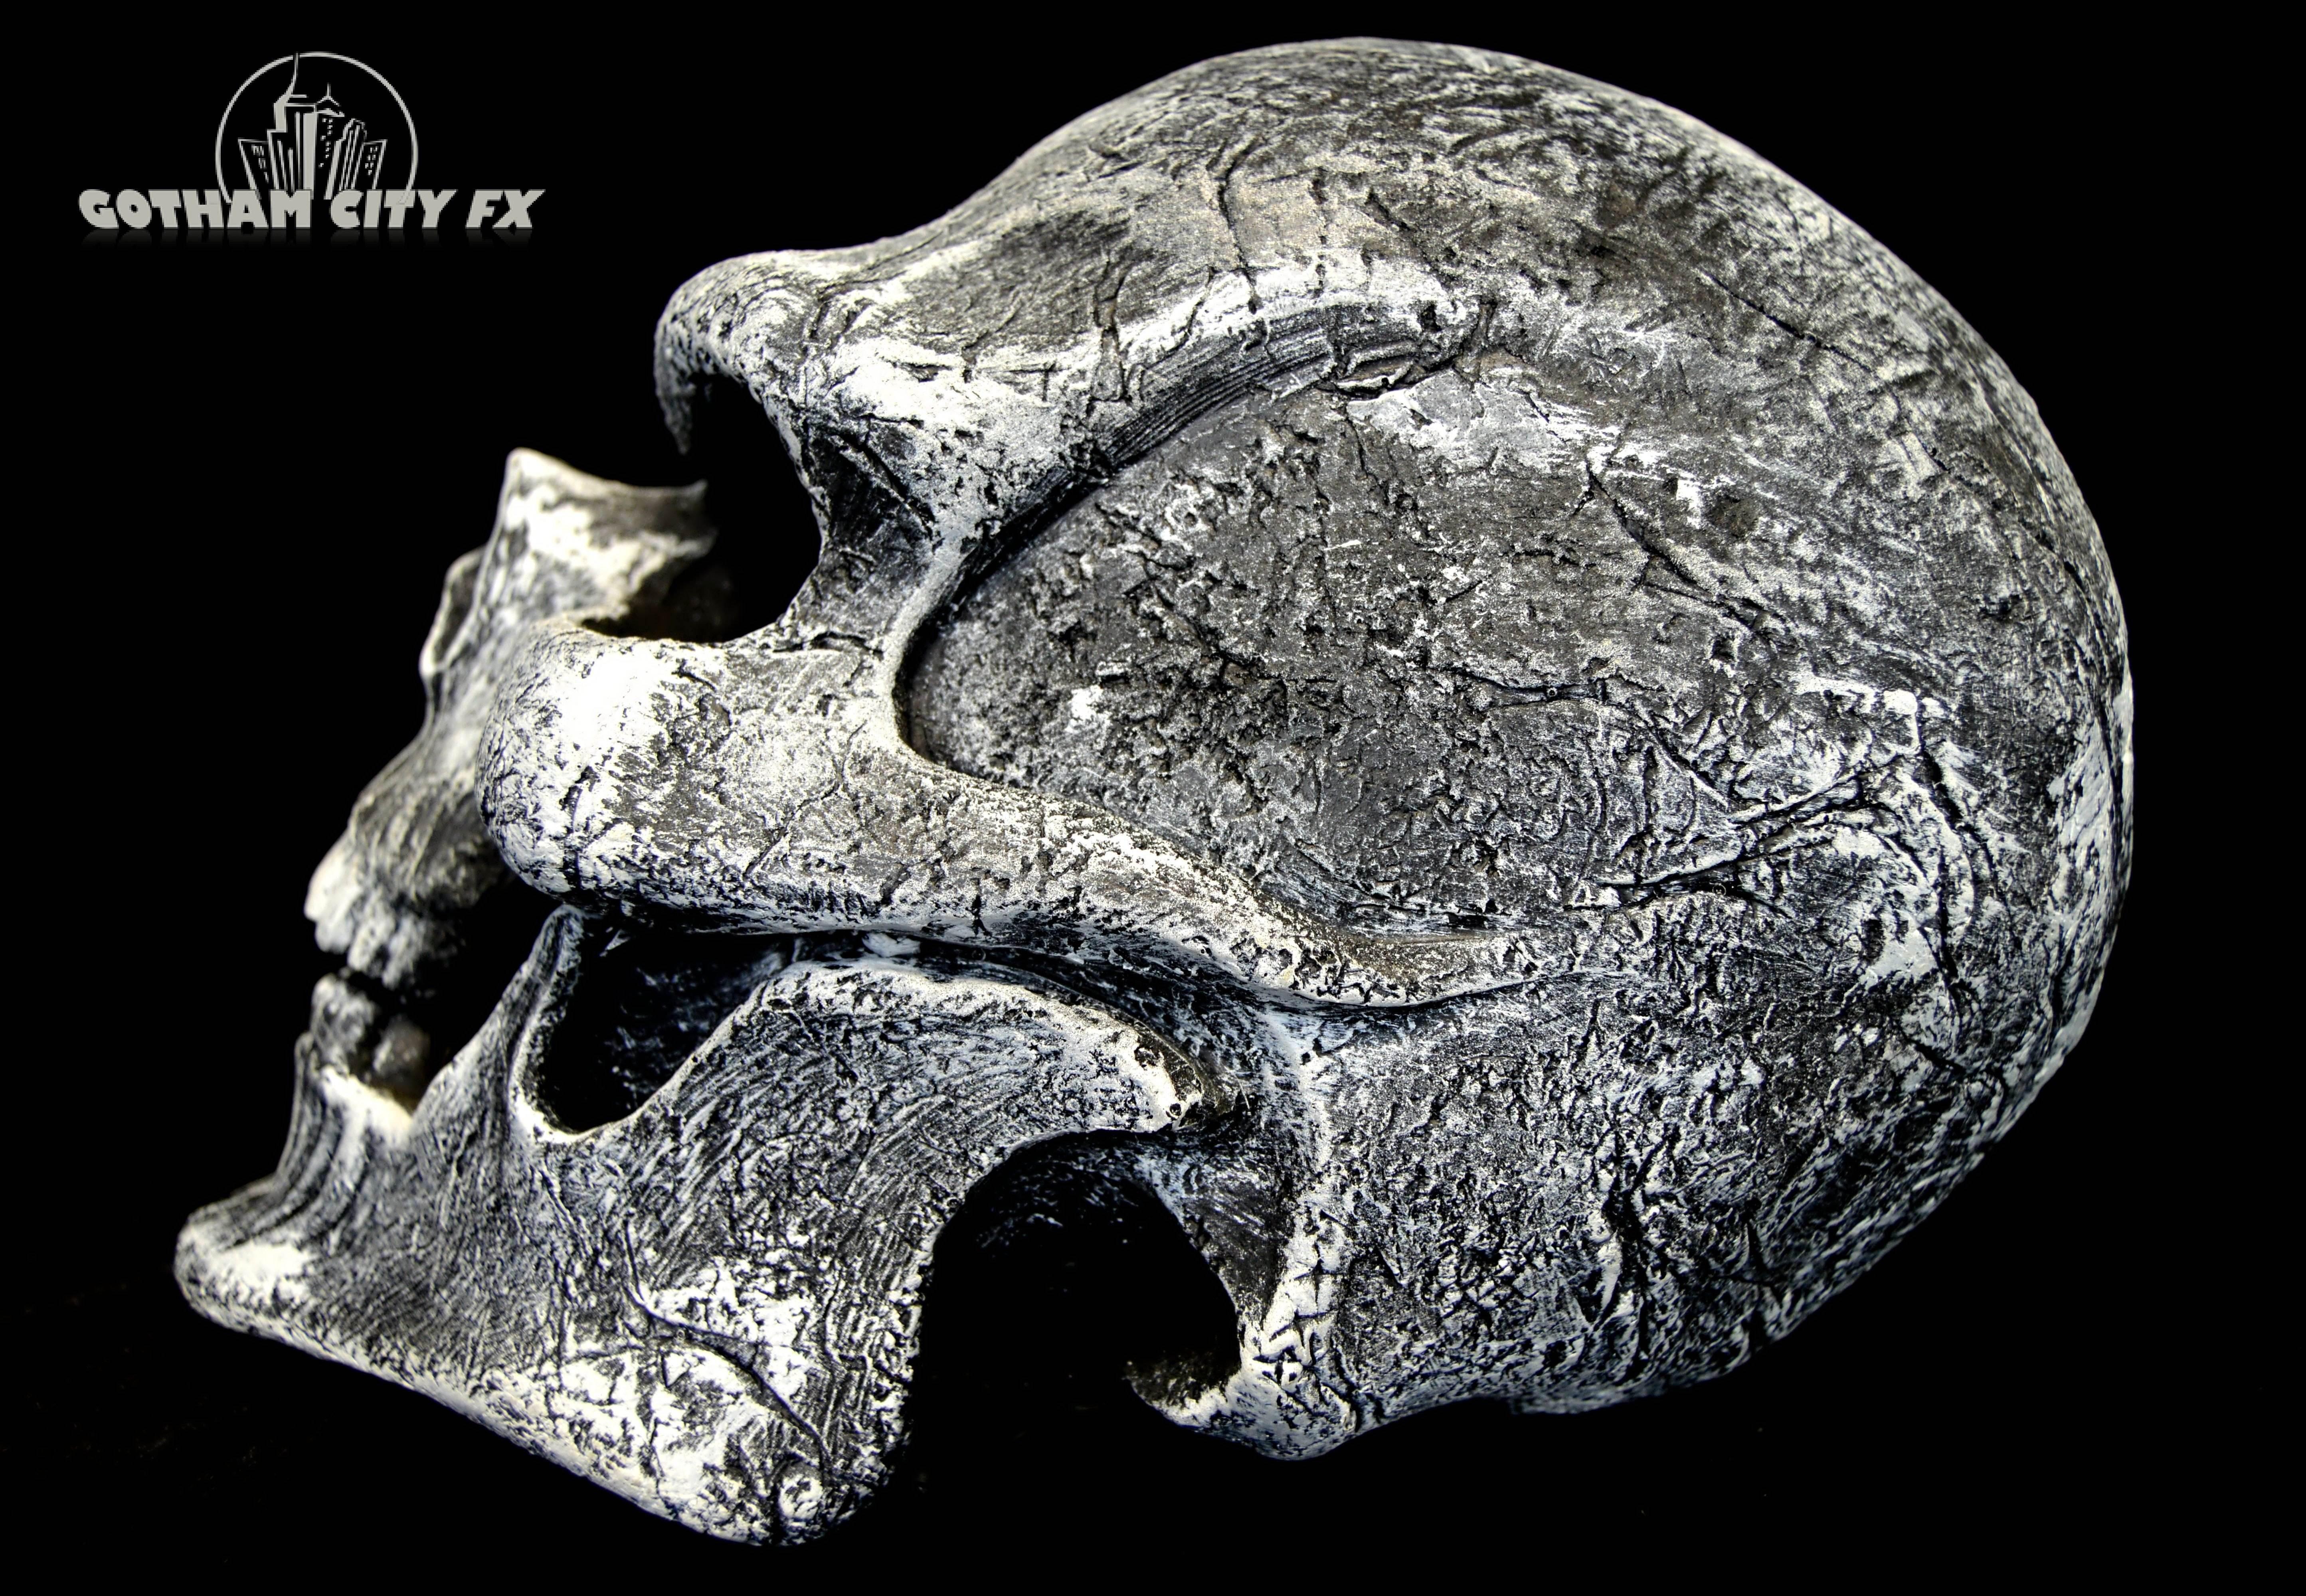 White Ghost Rider Skull Mask · Gotham City FX · Online Store ...